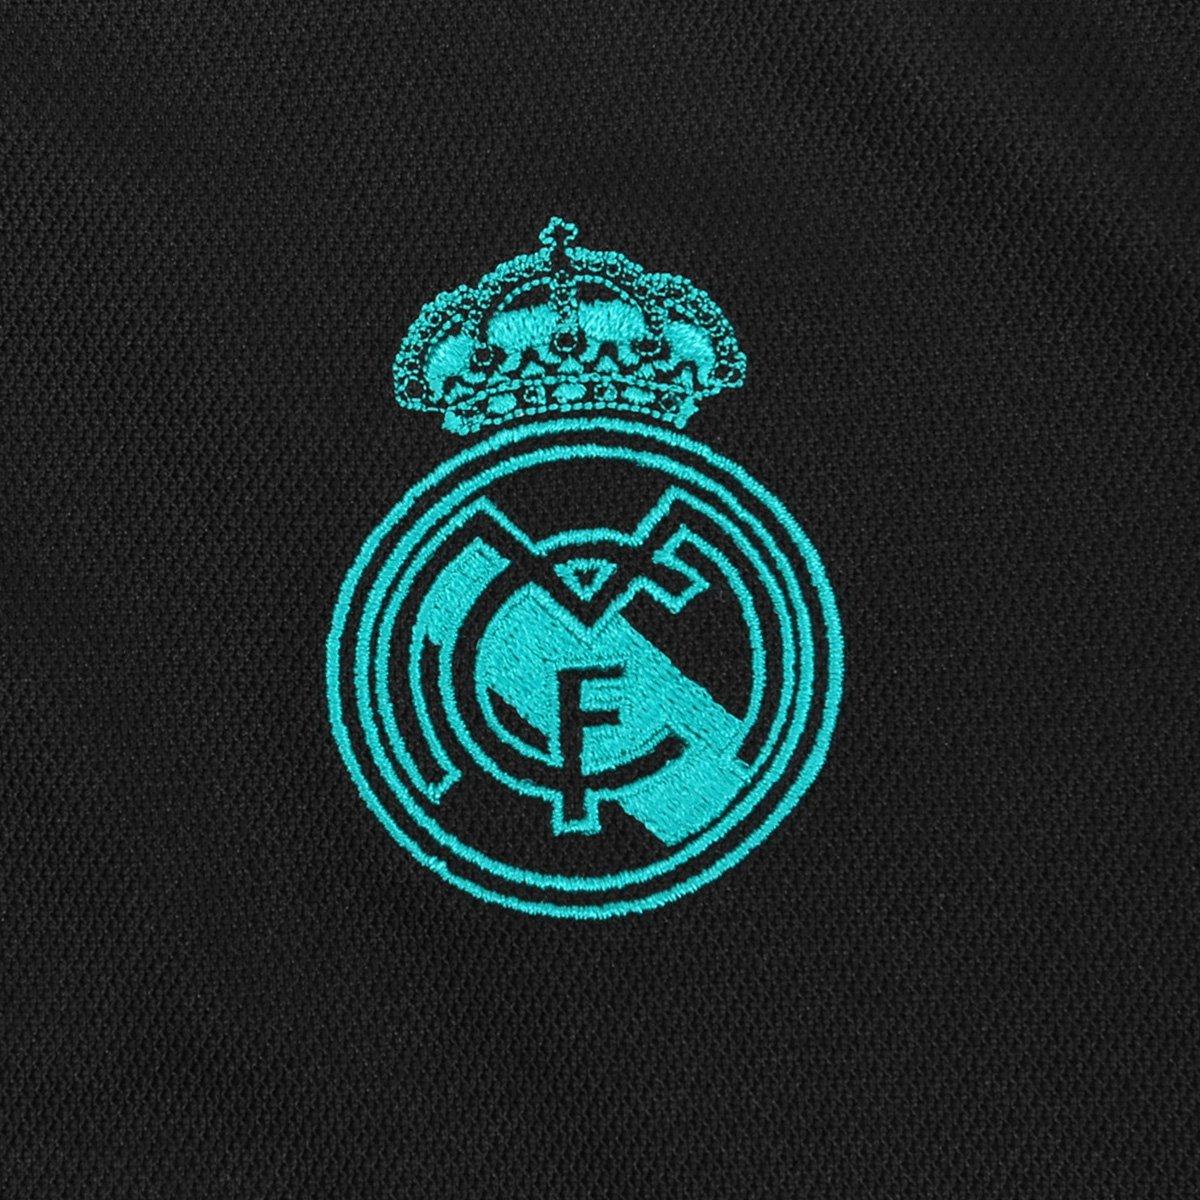 1b293f548 Camisa Real Madrid Infantil Away 17 18 s nº Torcedor Adidas